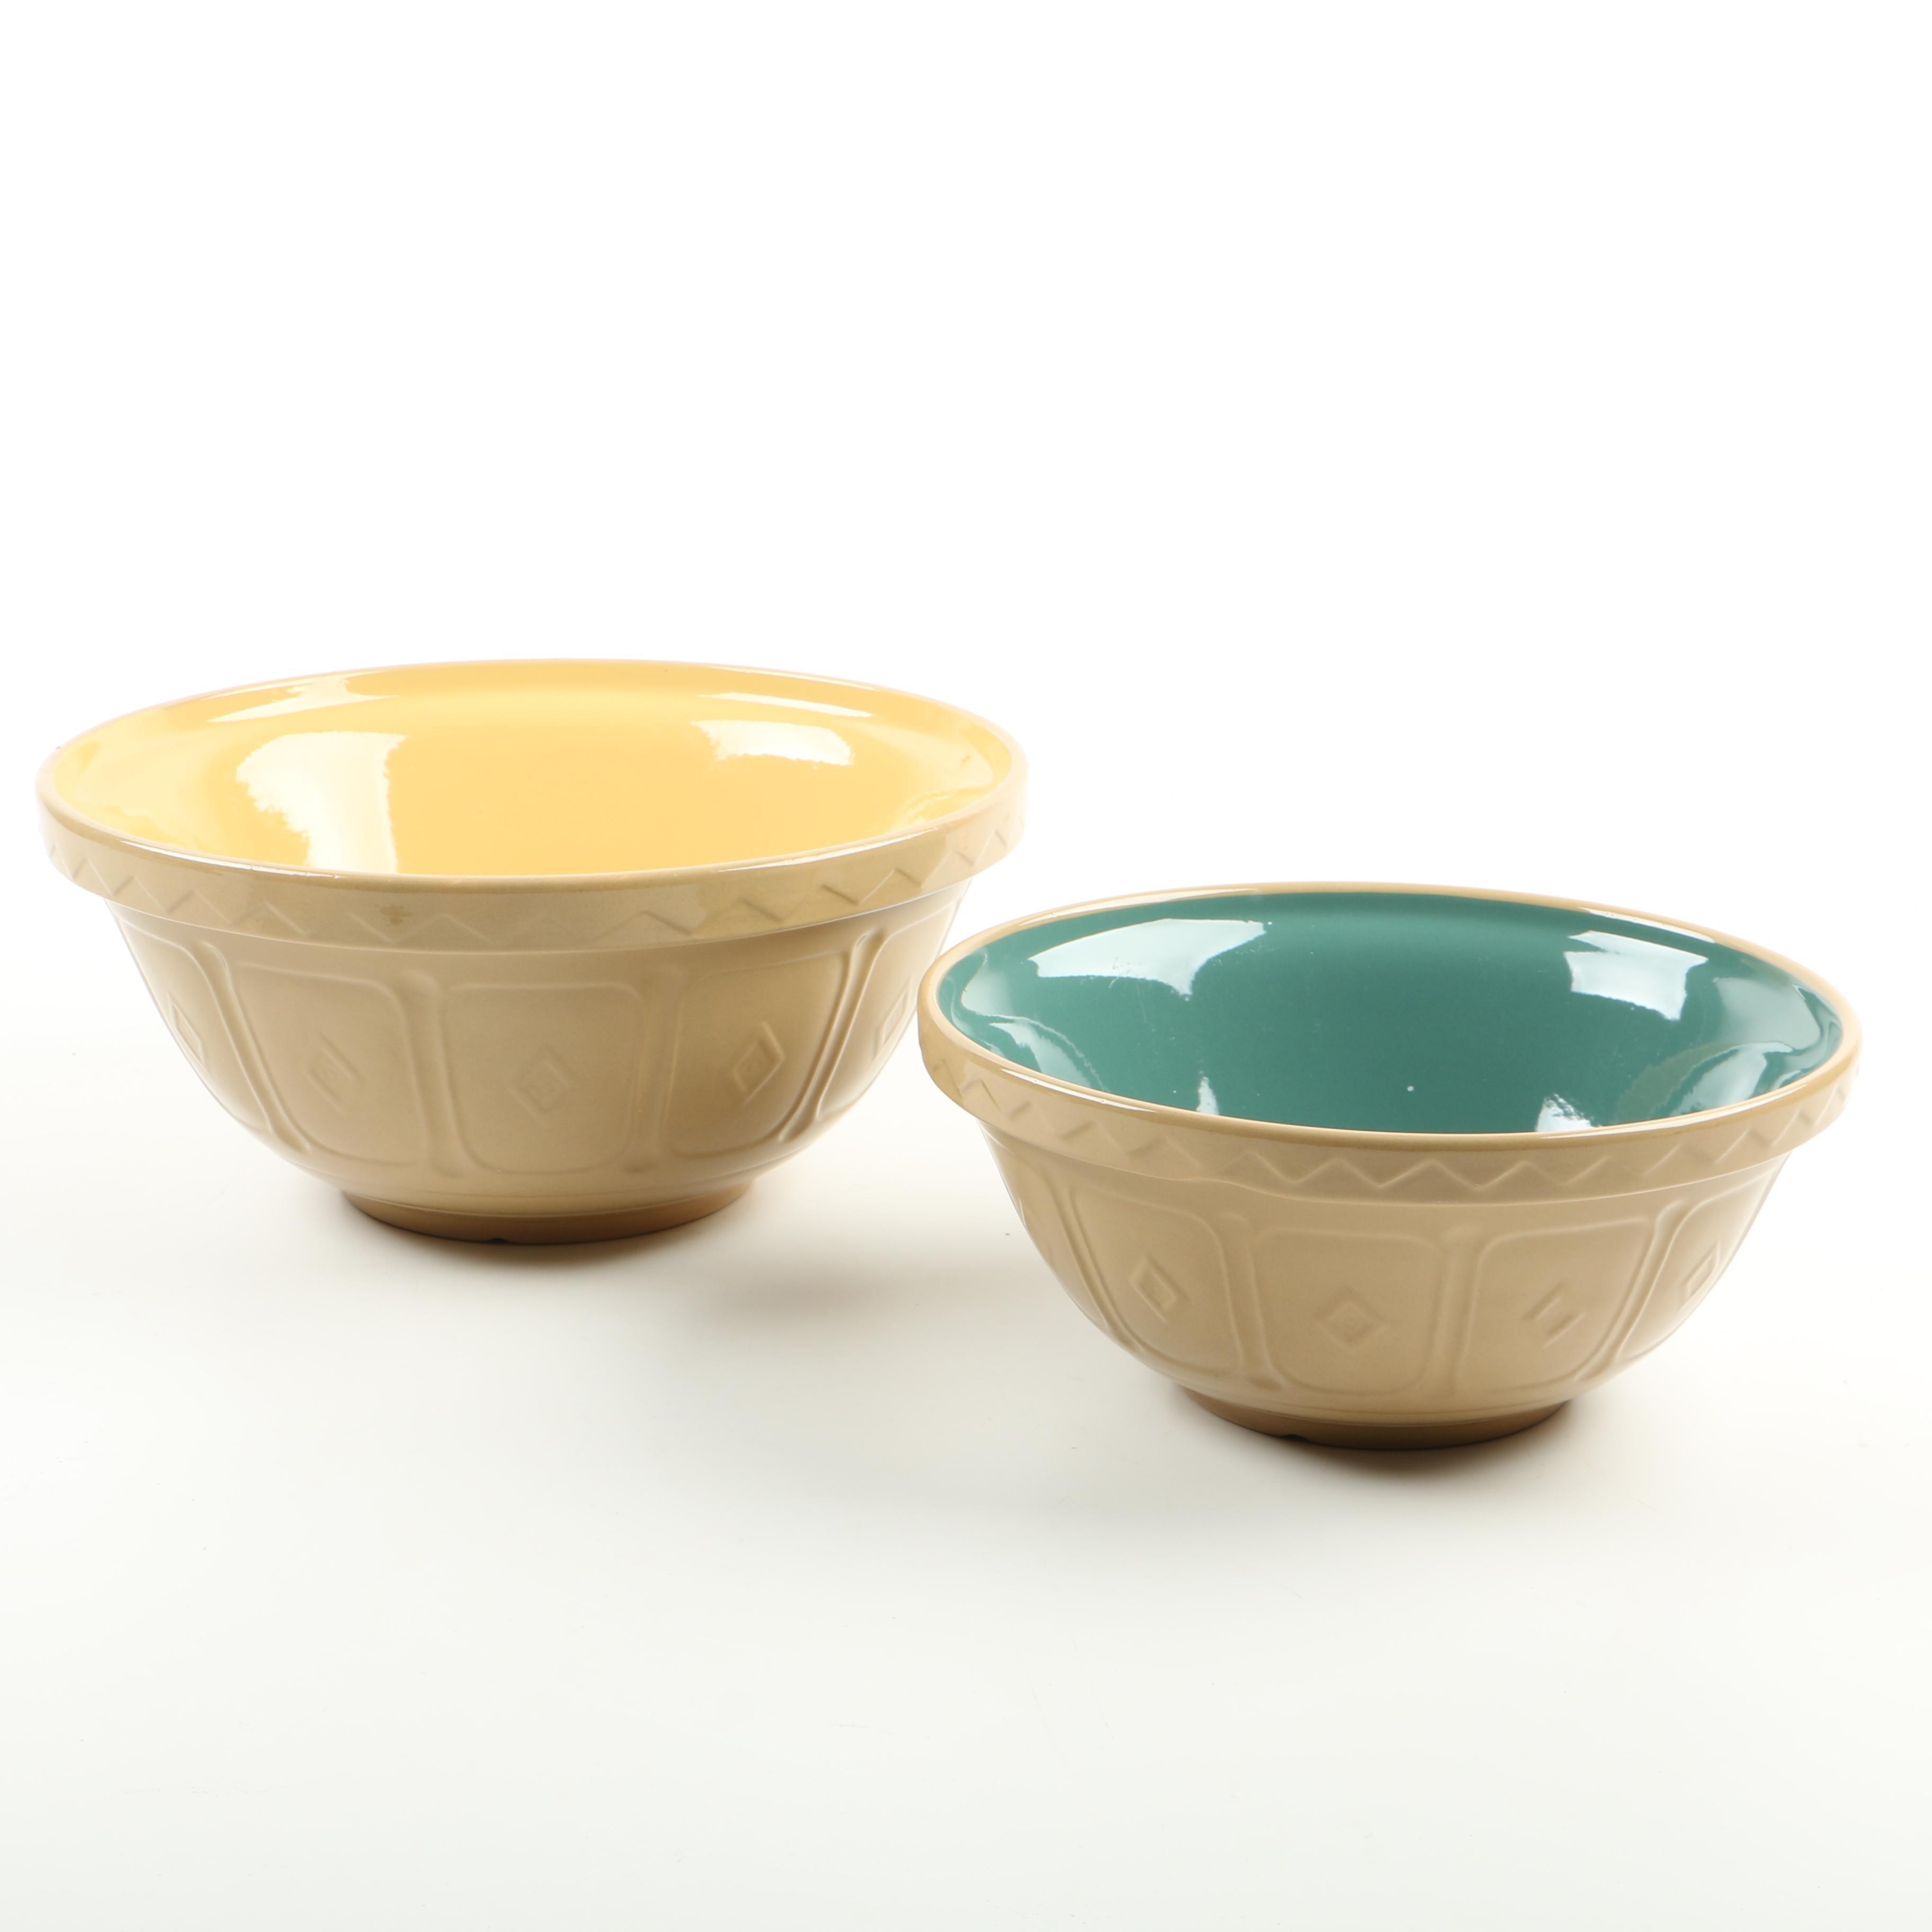 Mason & Cash Co Mixing Stoneware Bowls, Made in England